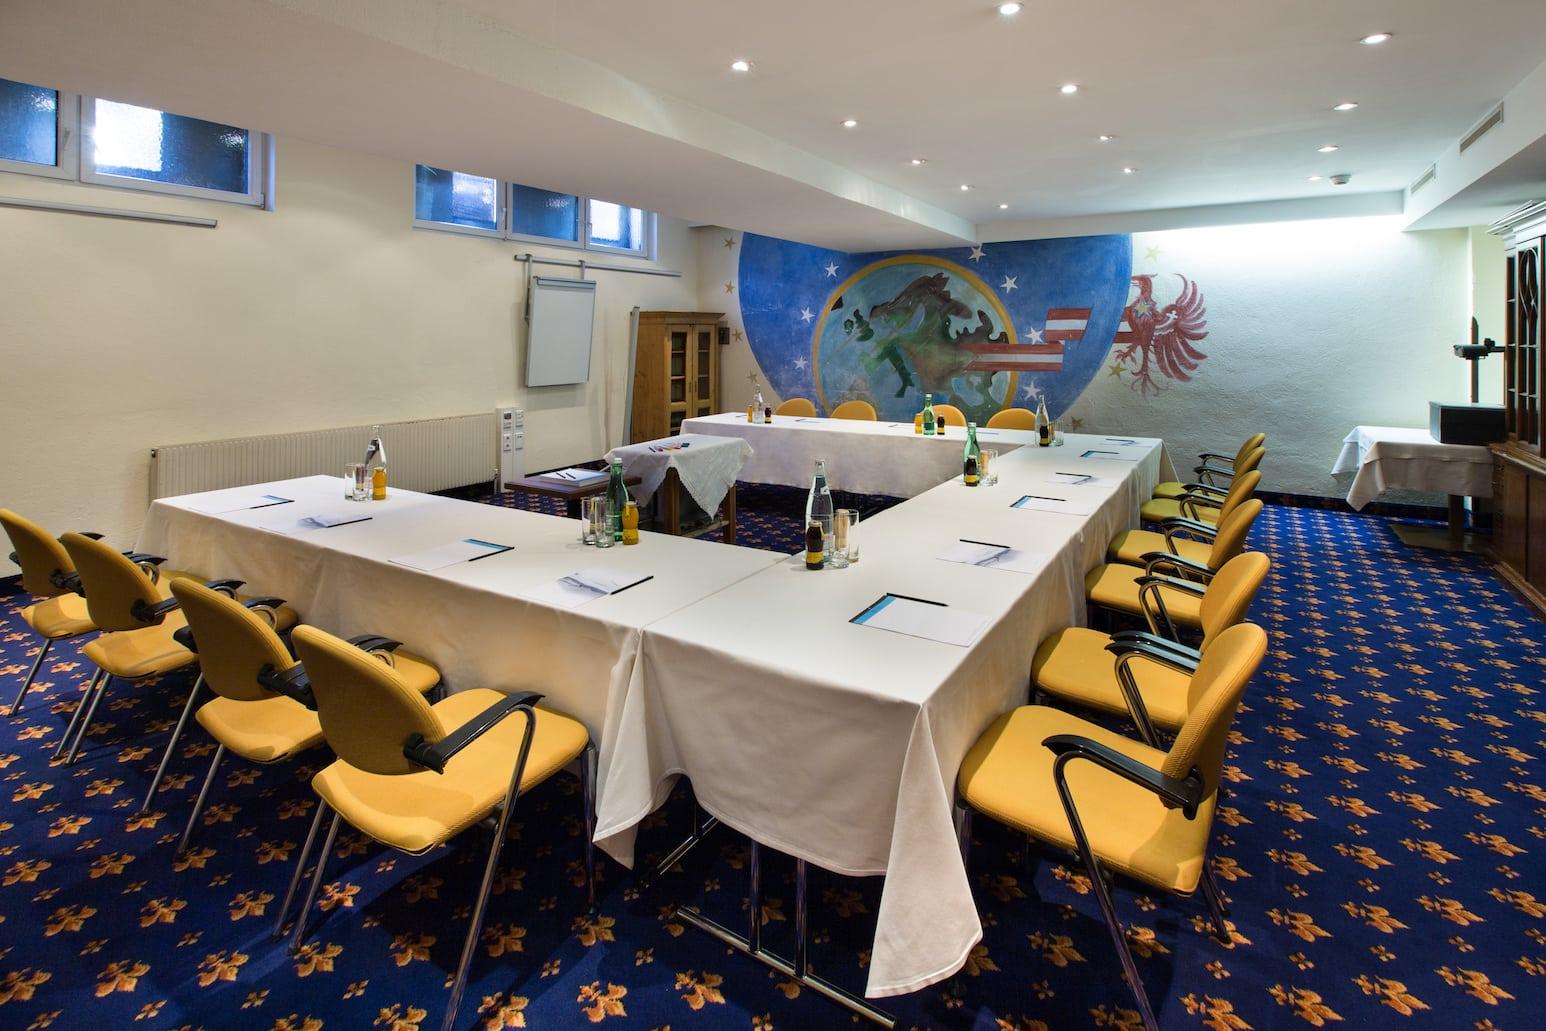 raffls_antonerhof_meeting_room_px3a8955